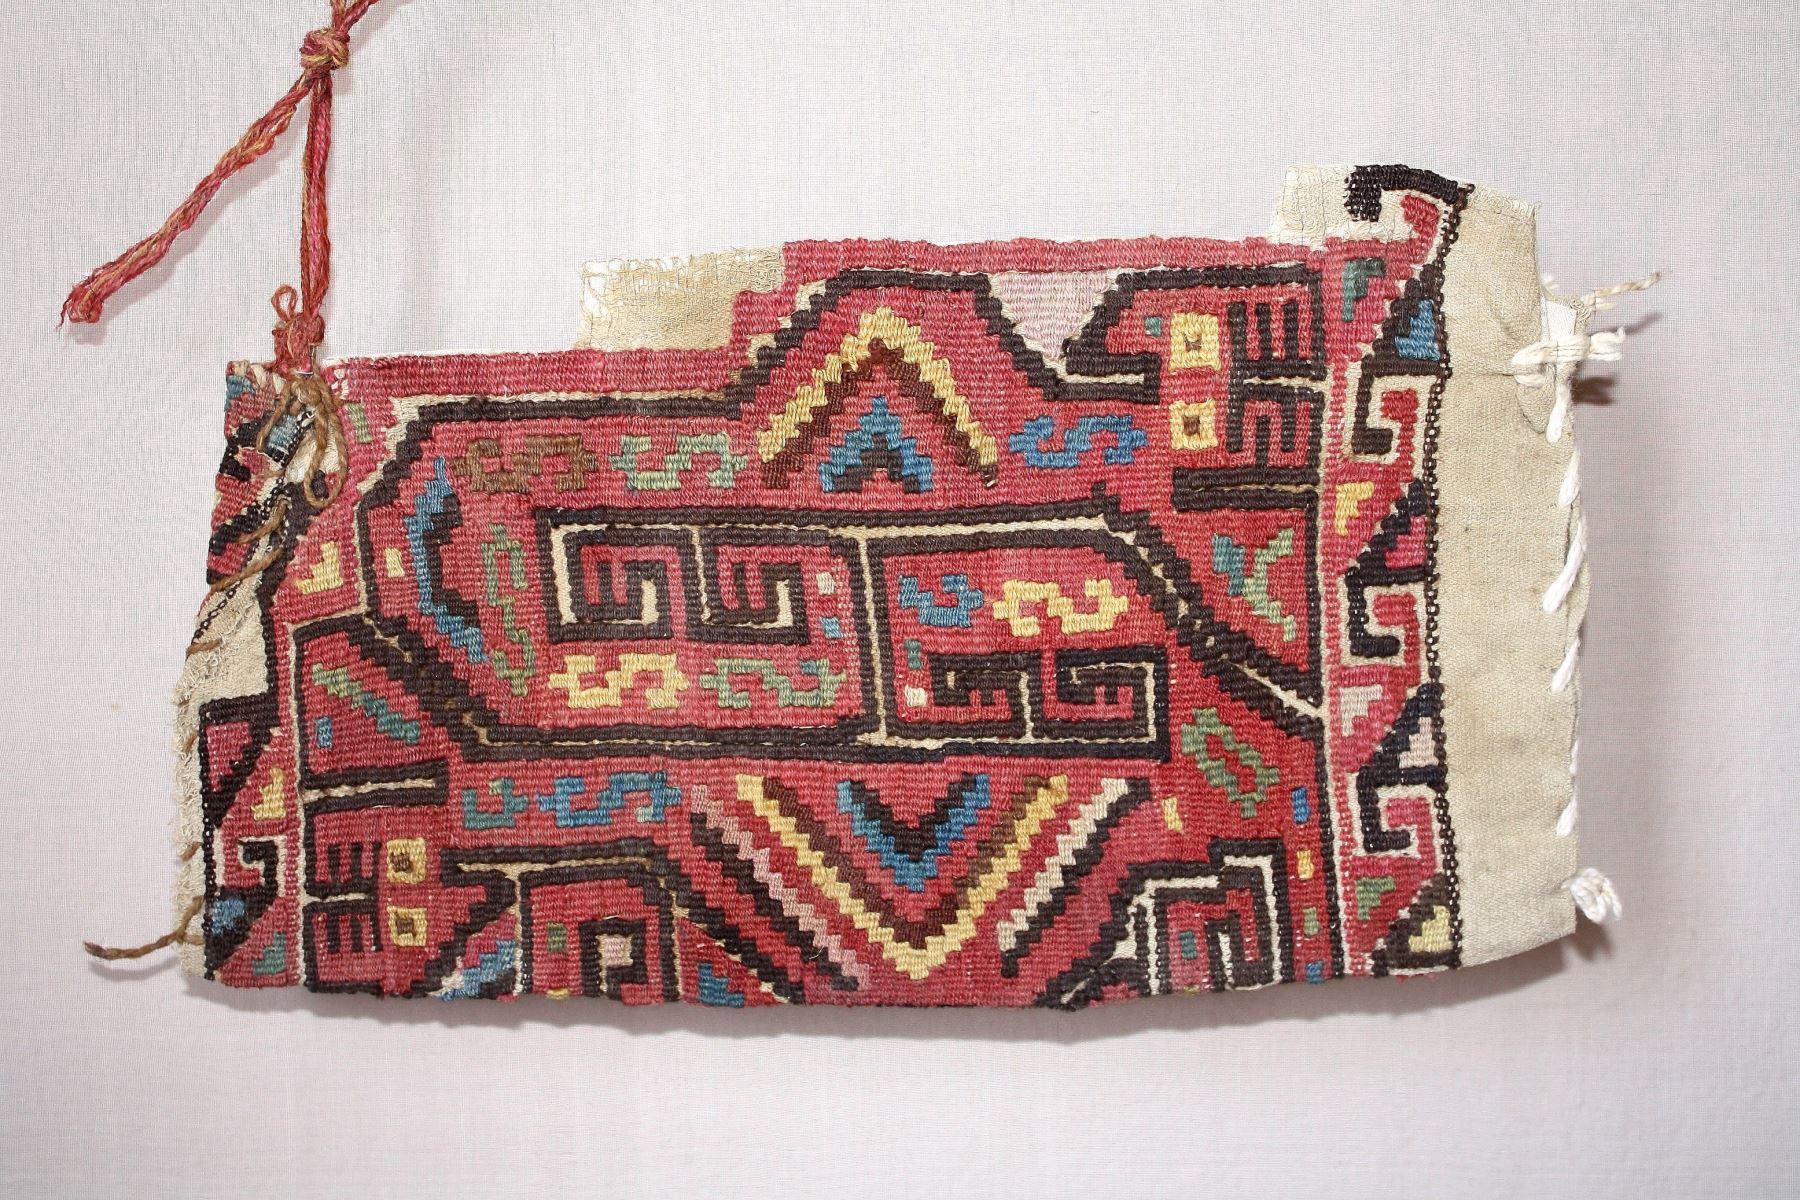 Bolsa de tapiz de la cultura Wari hallada en la huaca Malena, de Asia, Cañete.